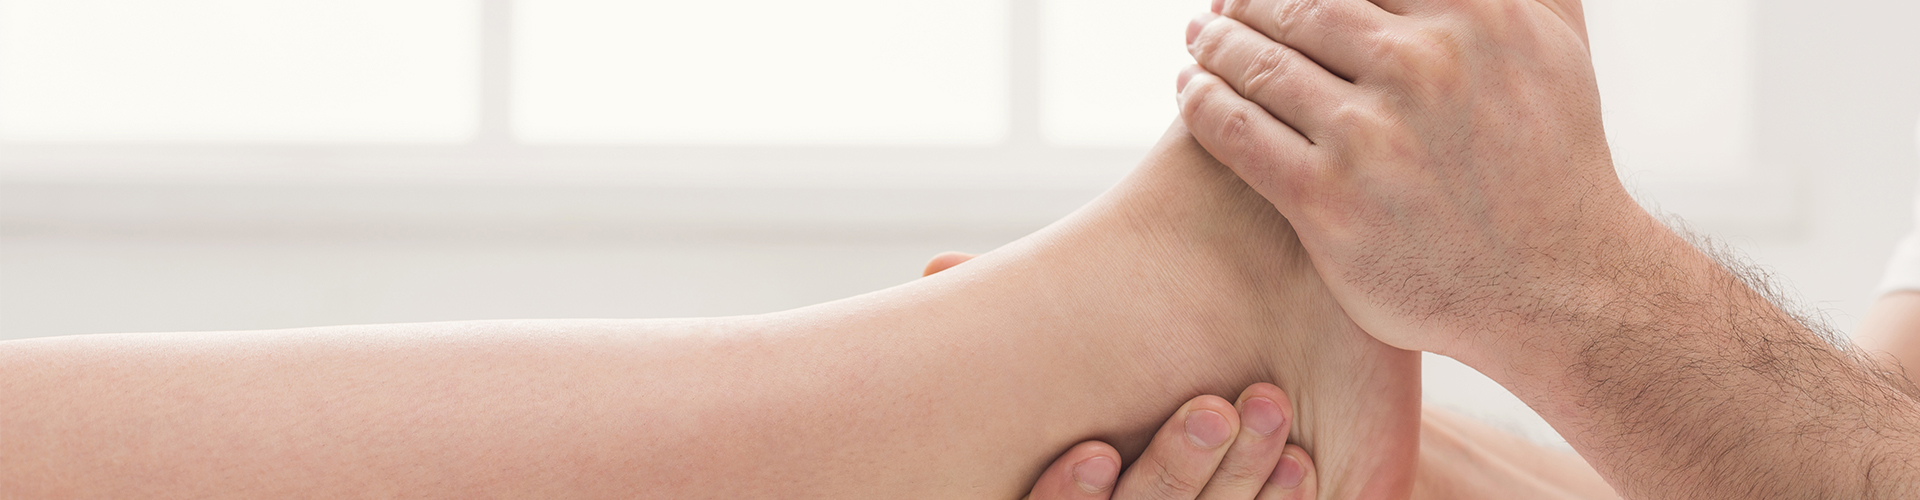 Hausarztpraxis | Dr. Gregor Weinstein